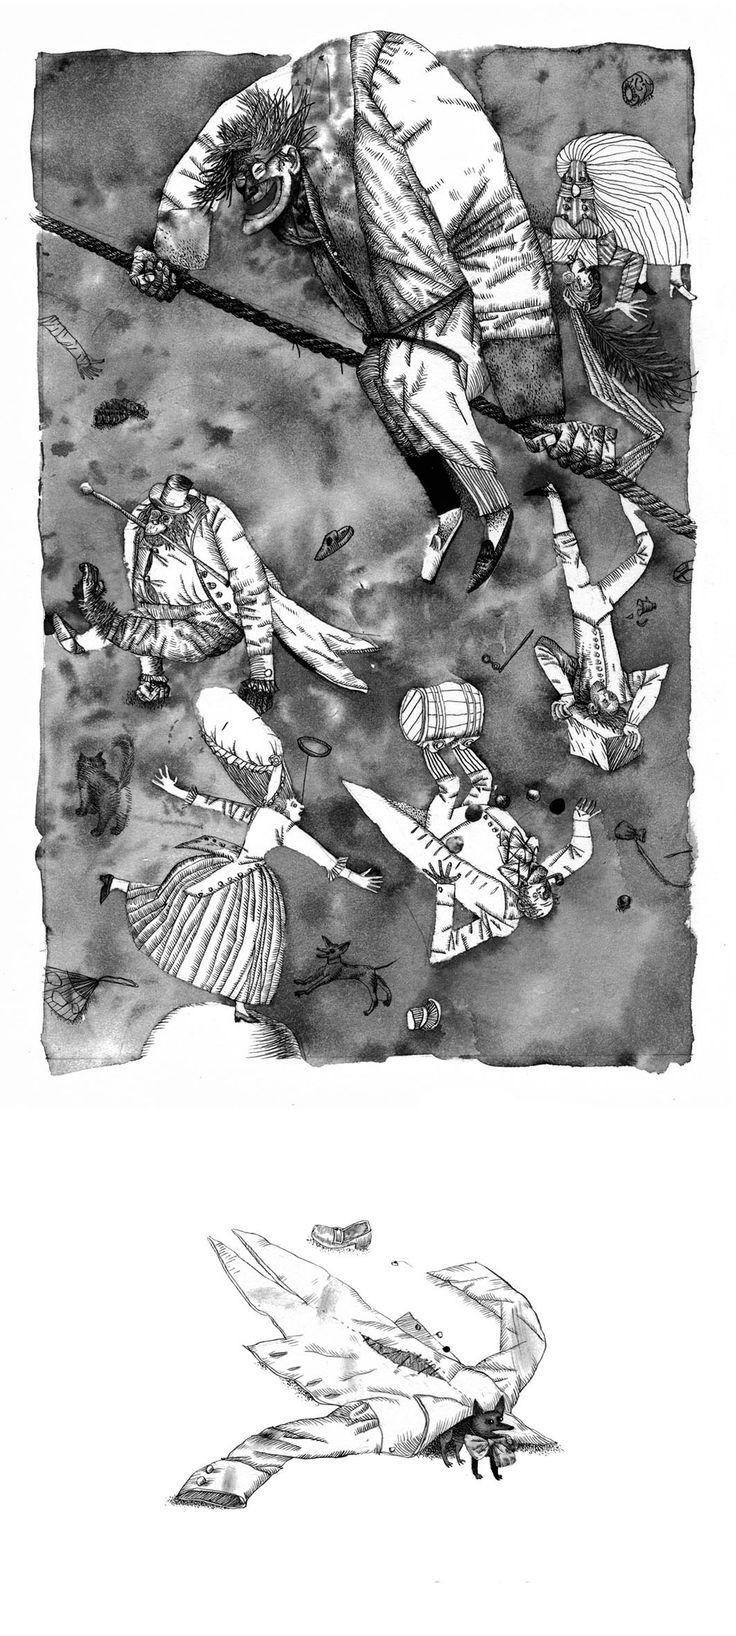 Wilhelm Hauff. Fairytales on Behance